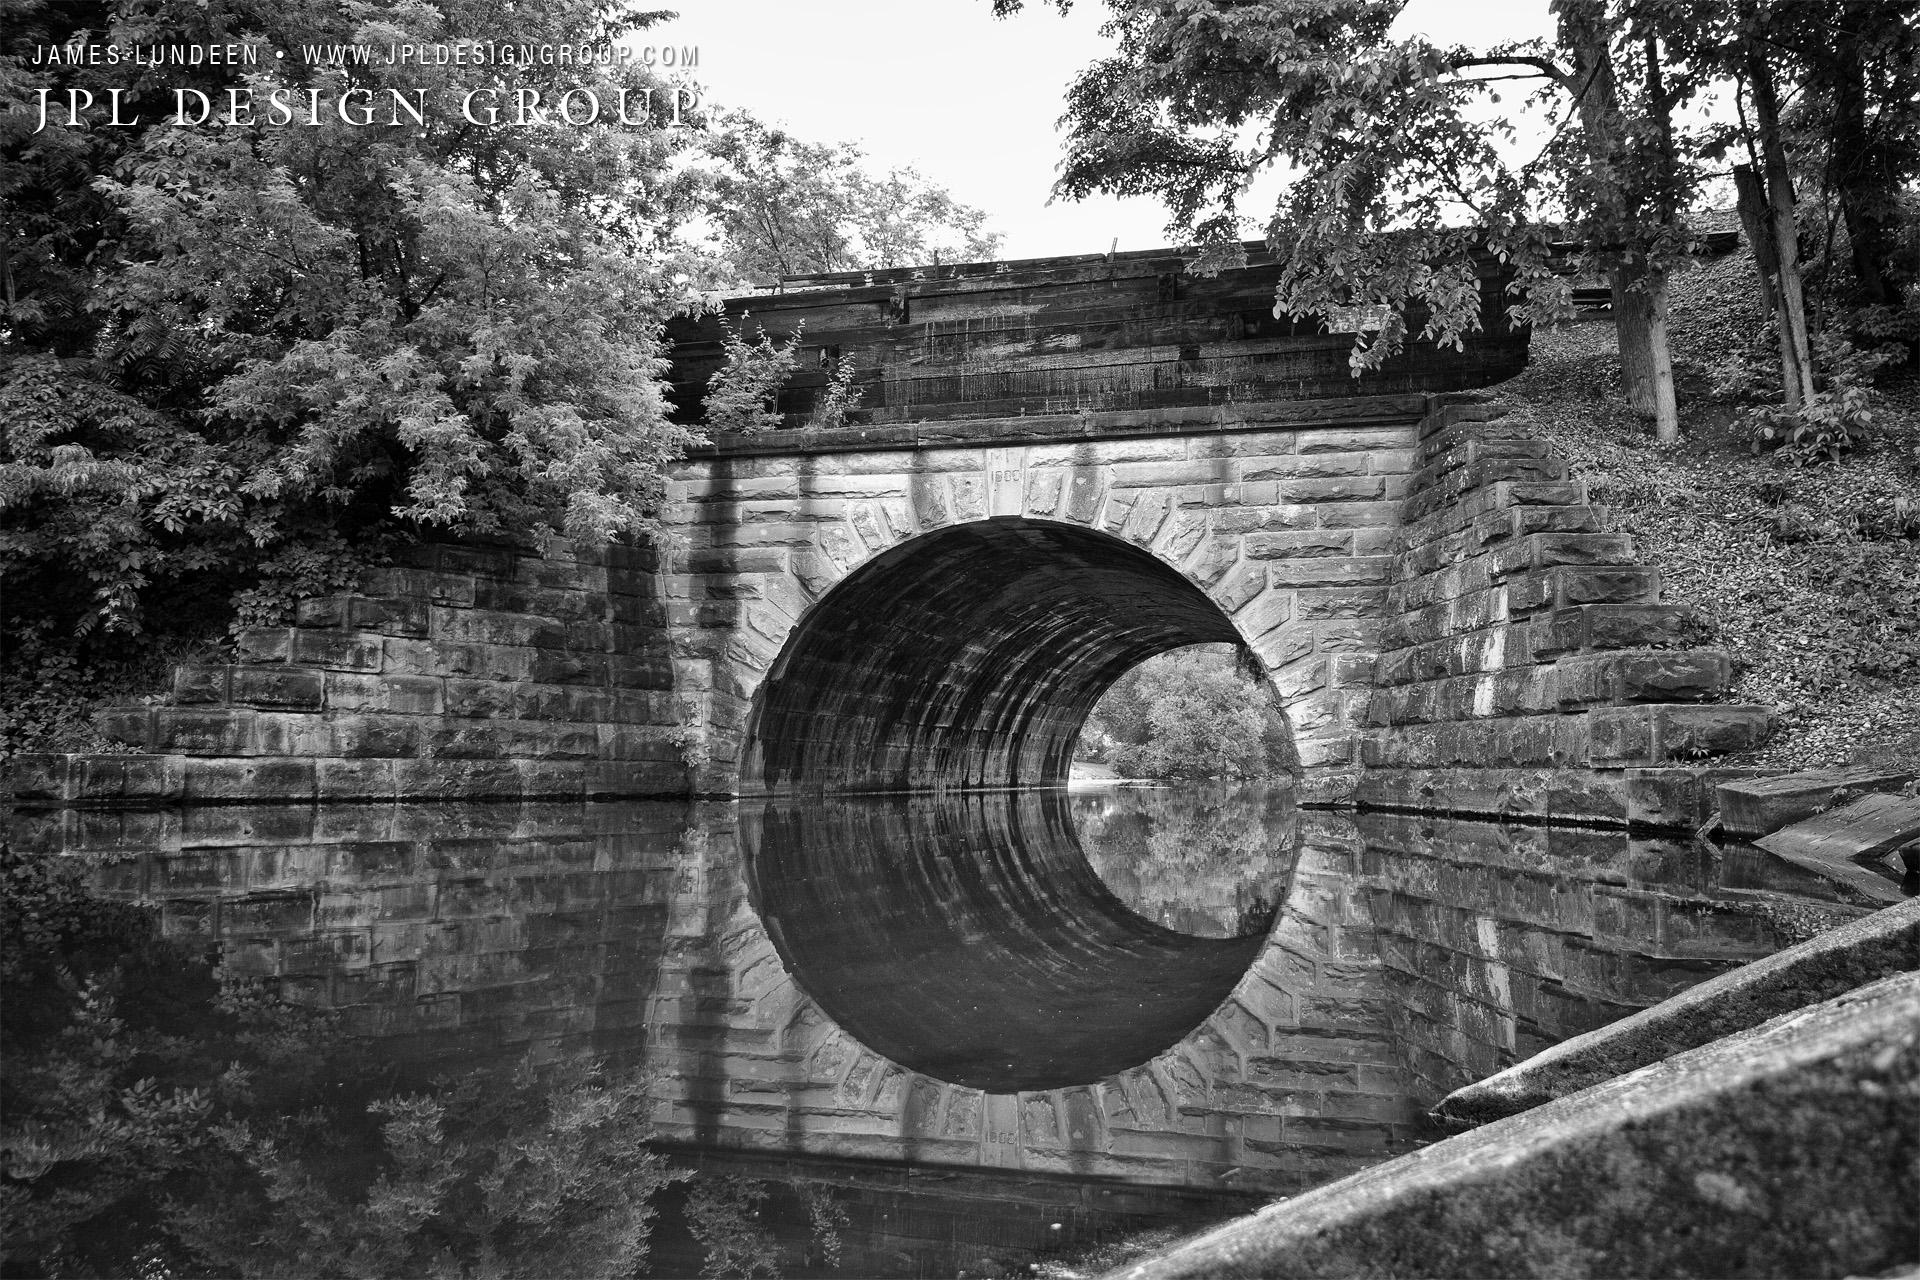 Milford, MI Railroad Bridge Photo Credit: James Lundeen